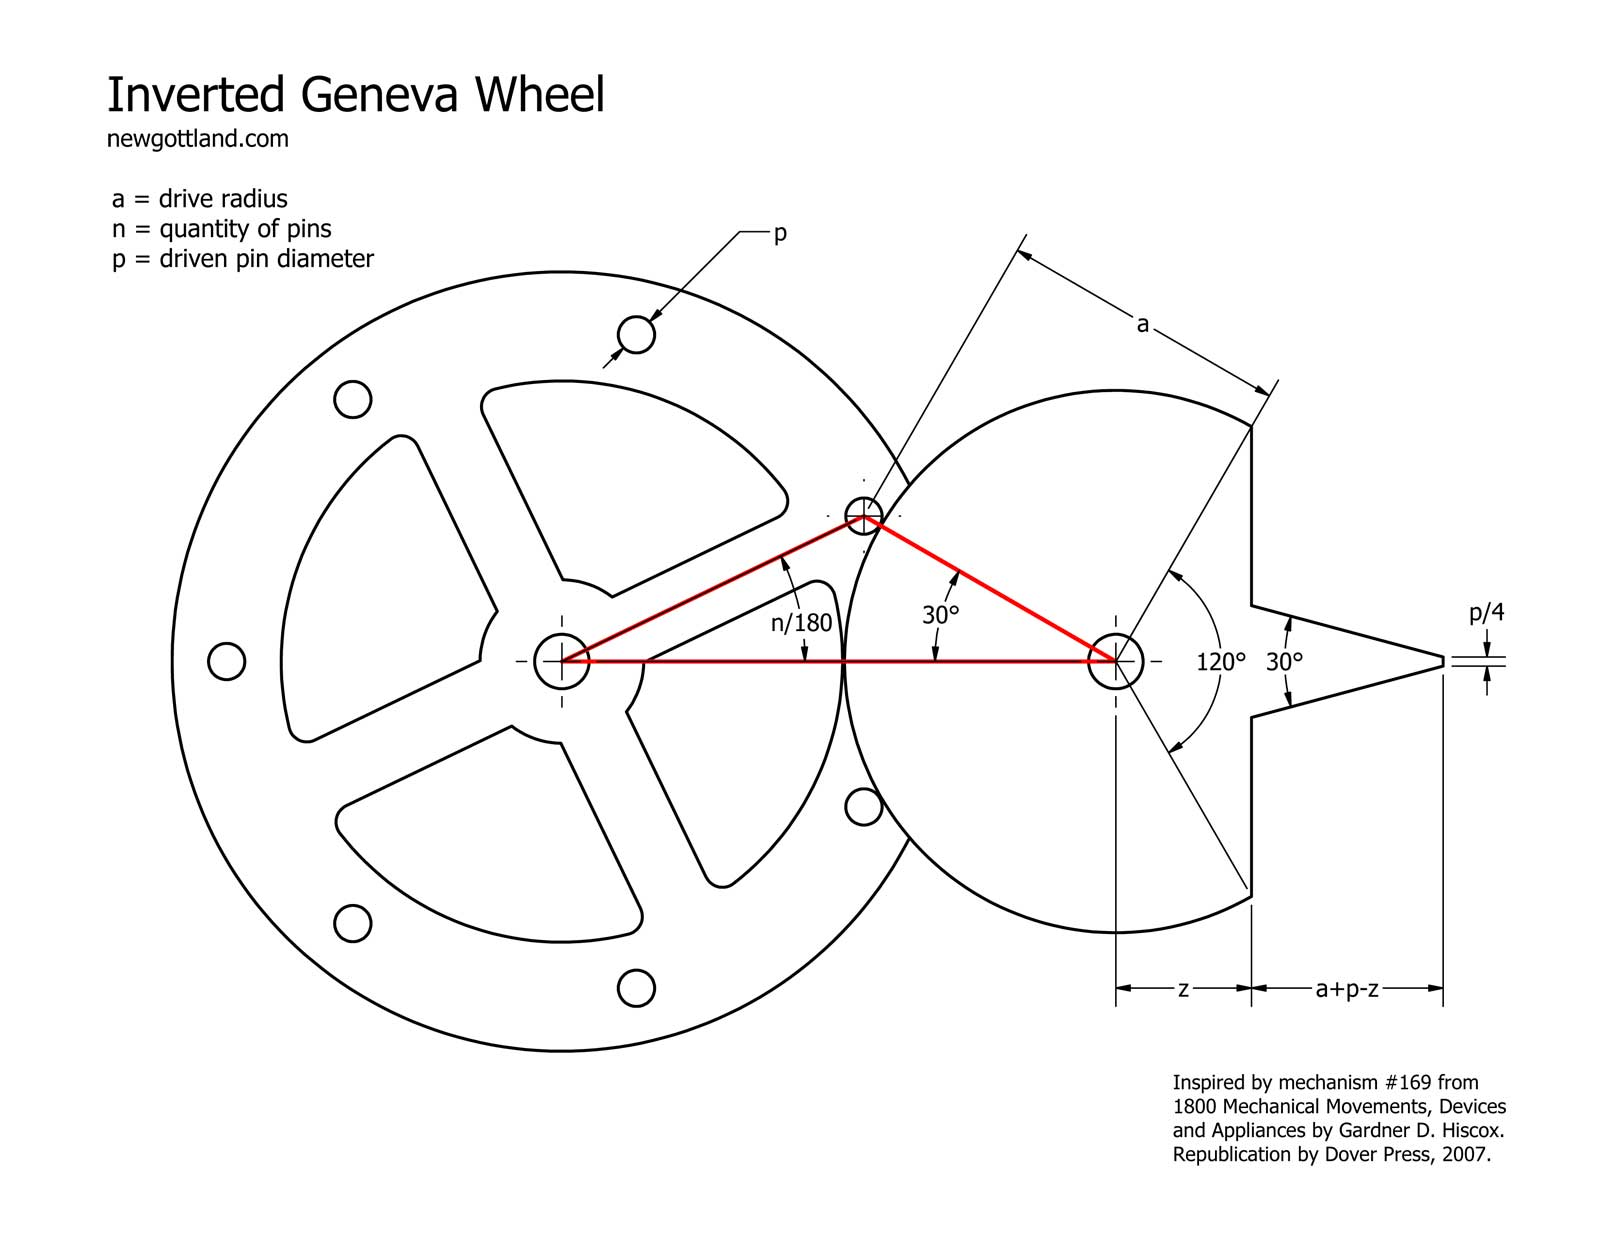 Inverted Geneva Wheel Mechanism | New Gottland